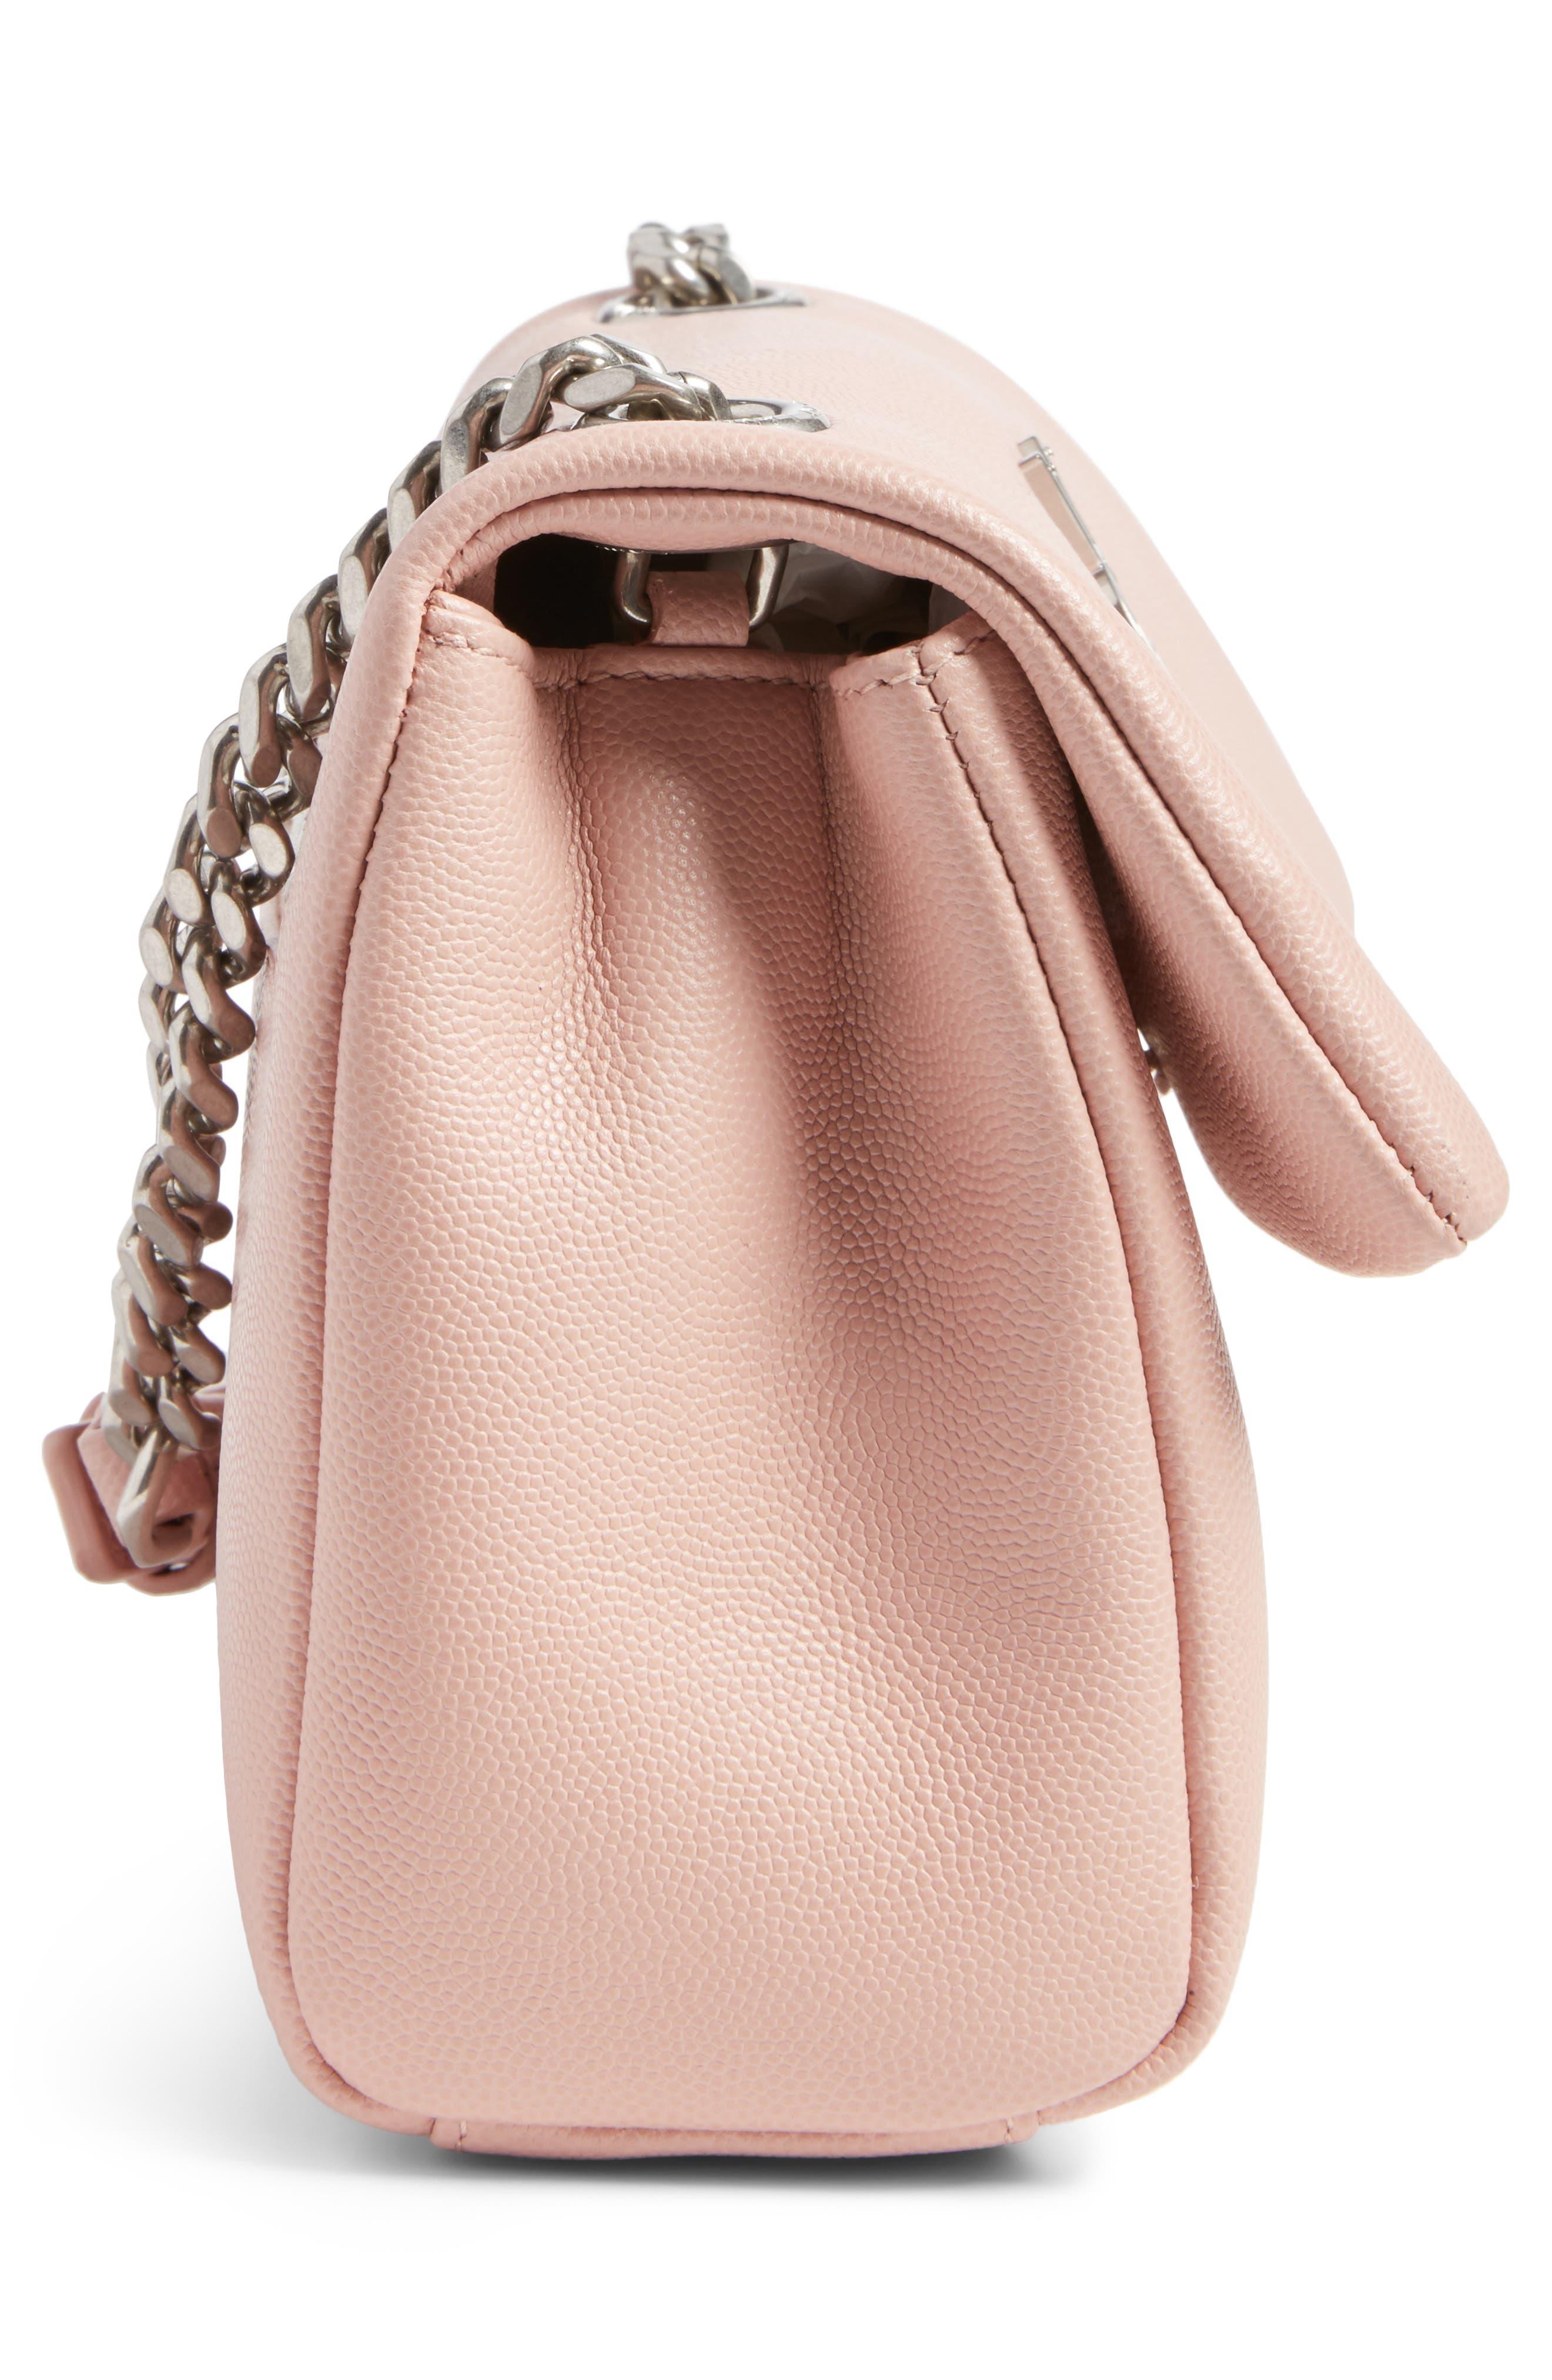 West Hollywood Calfskin Leather Messenger Bag,                             Alternate thumbnail 18, color,